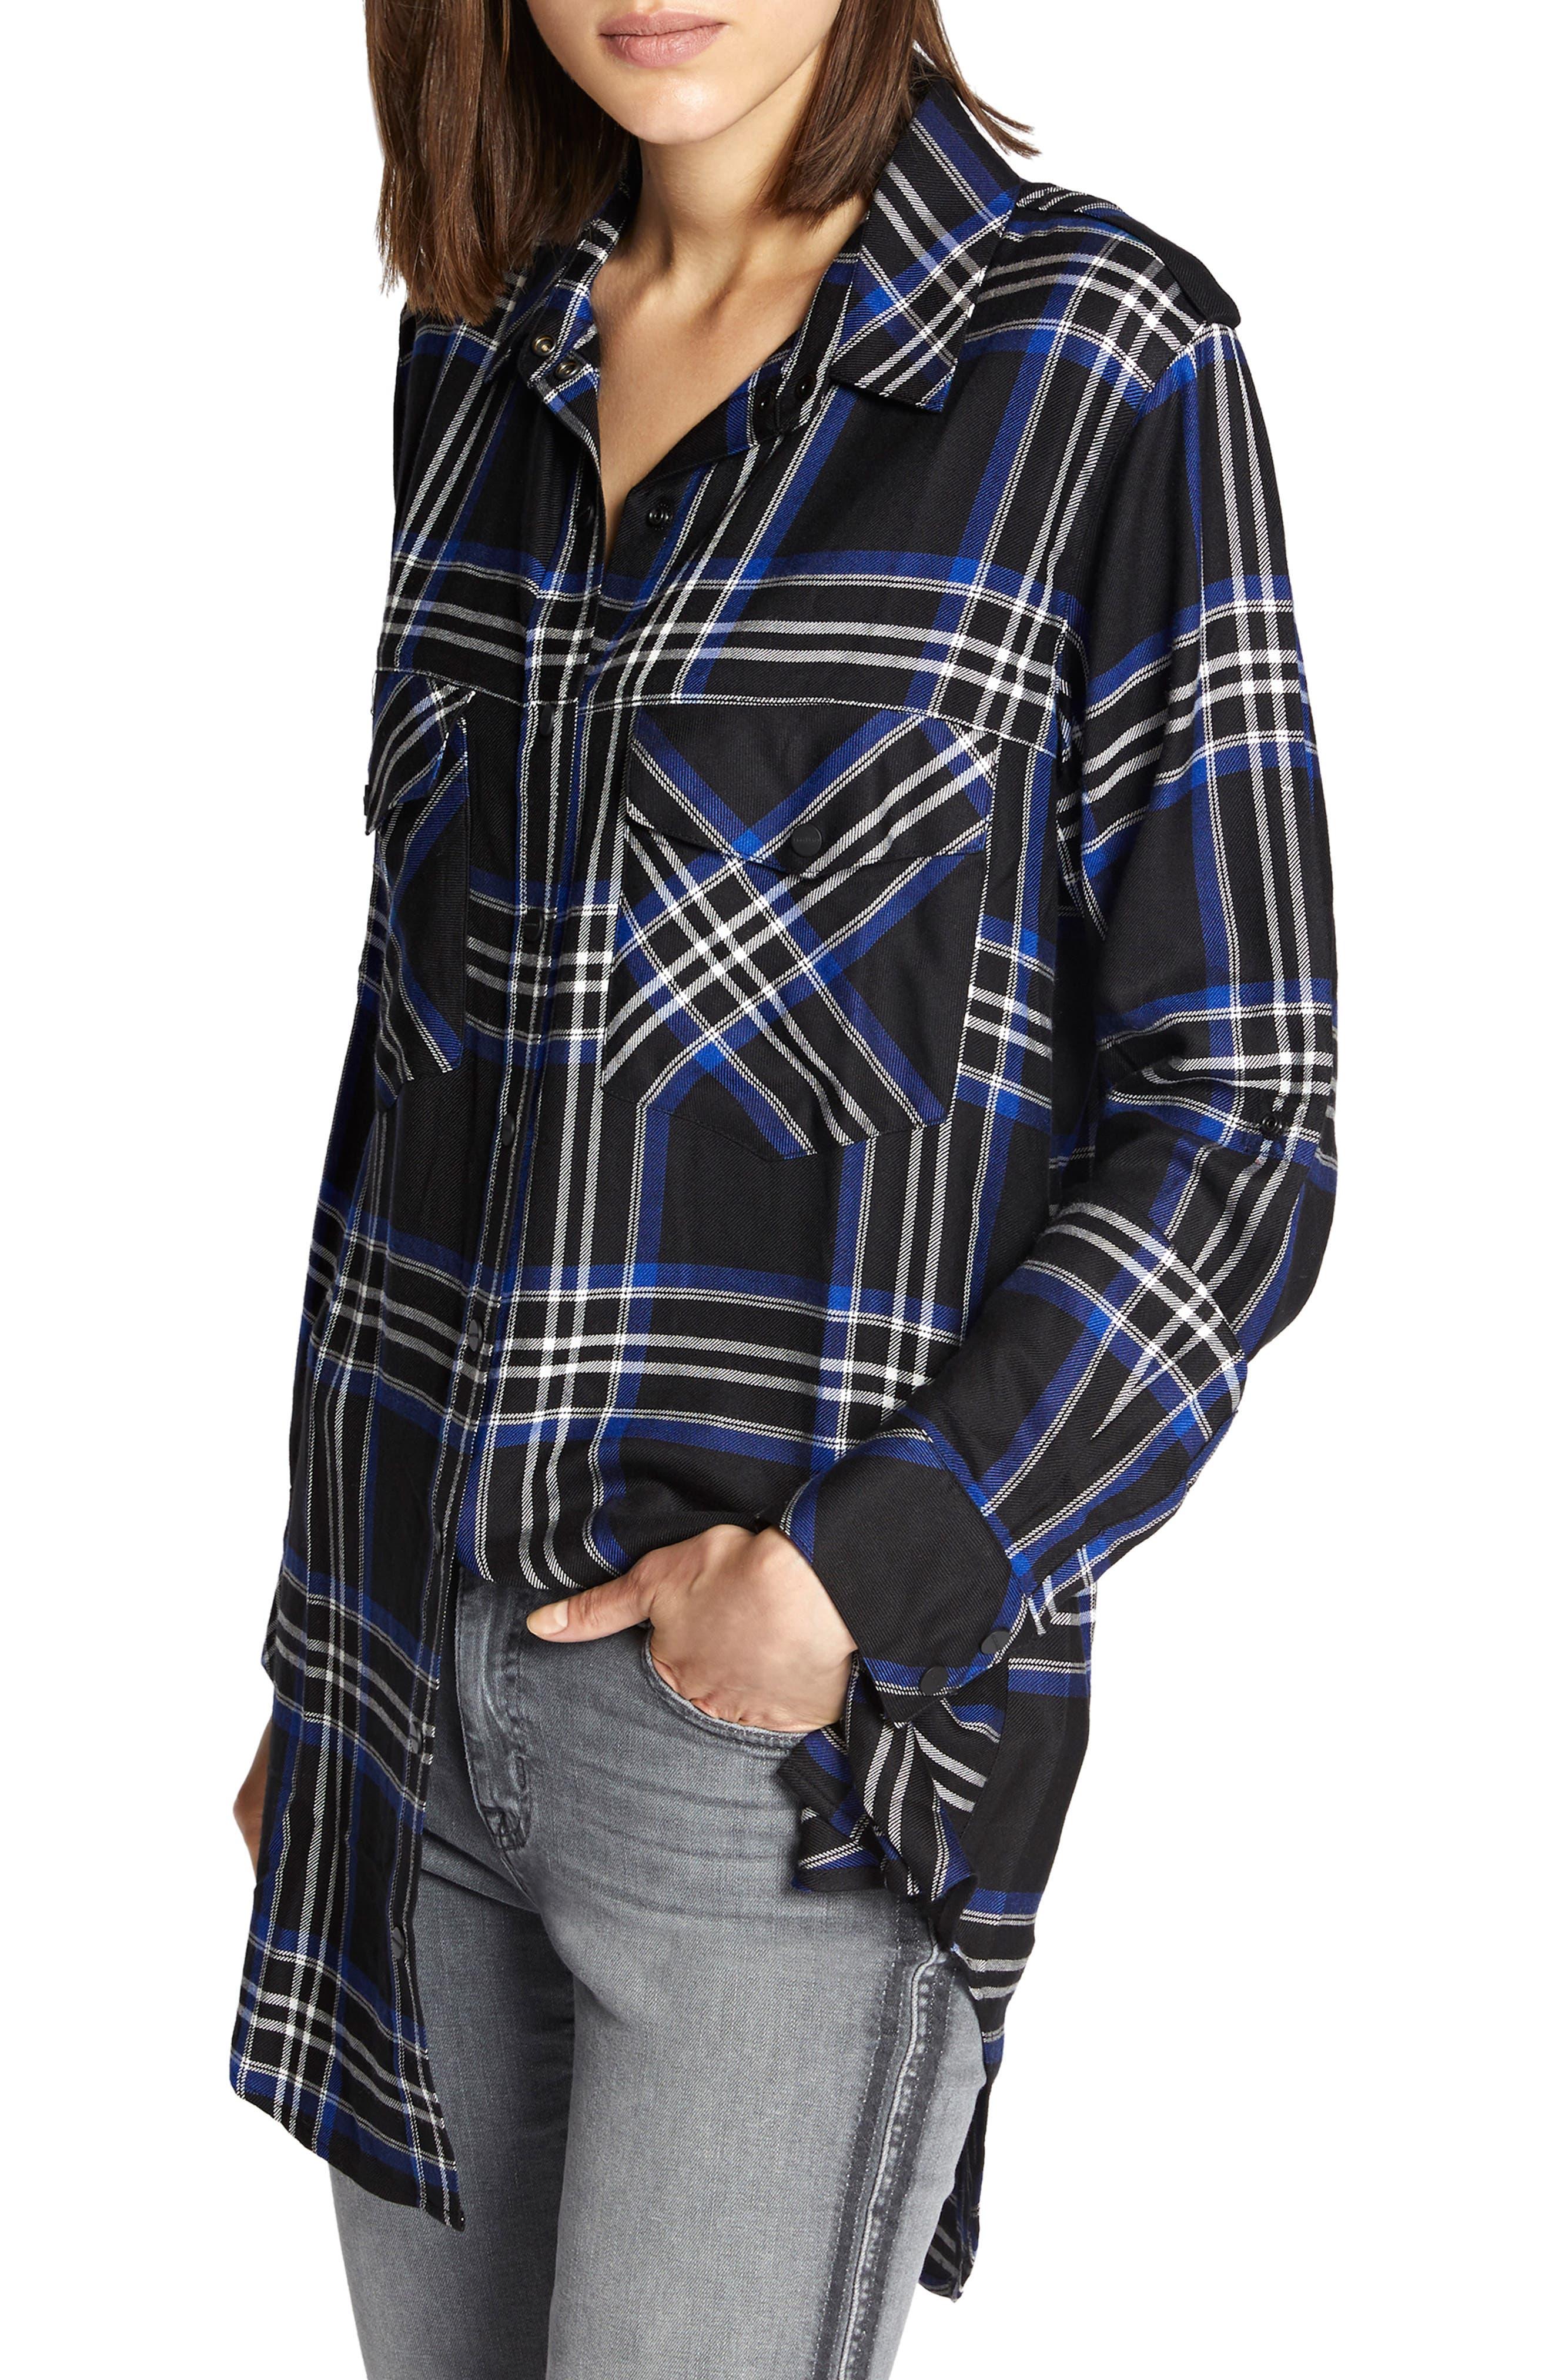 Sanctuary Main Street Plaid Boyfriend Tunic Shirt, Black